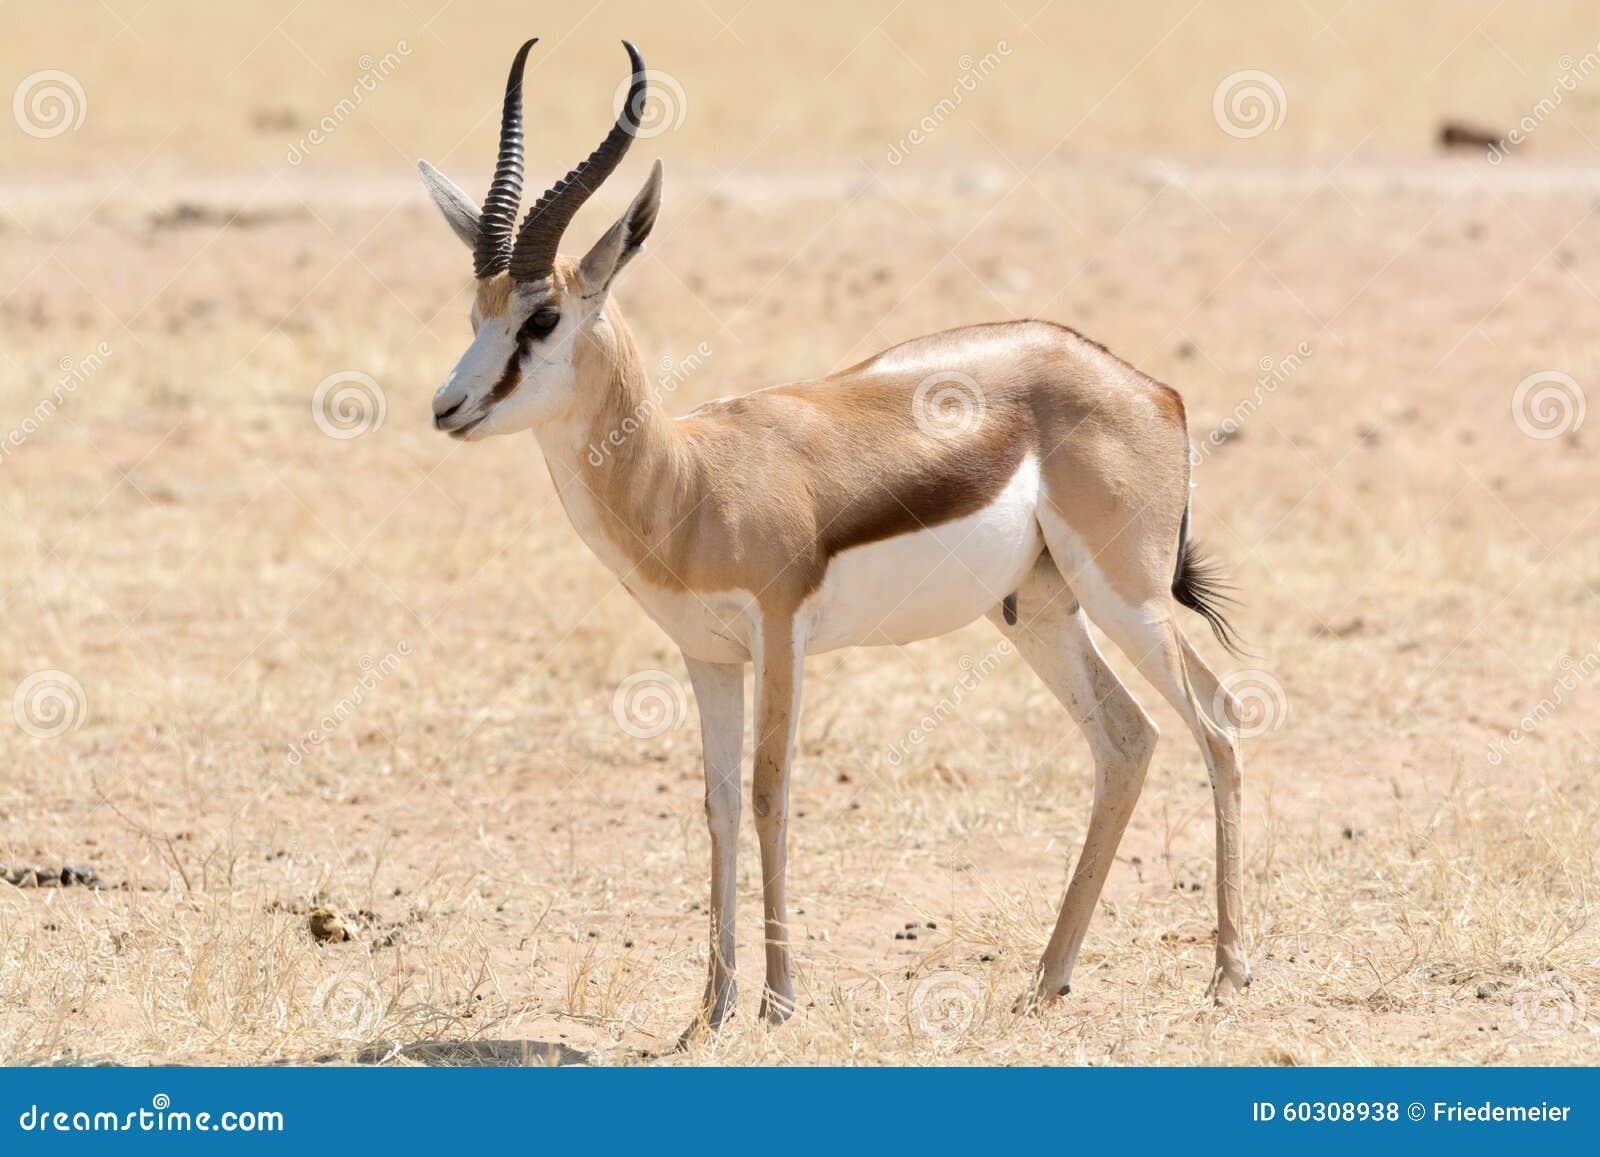 Springbock, Portrait Stock Photo. Image Of Antilope